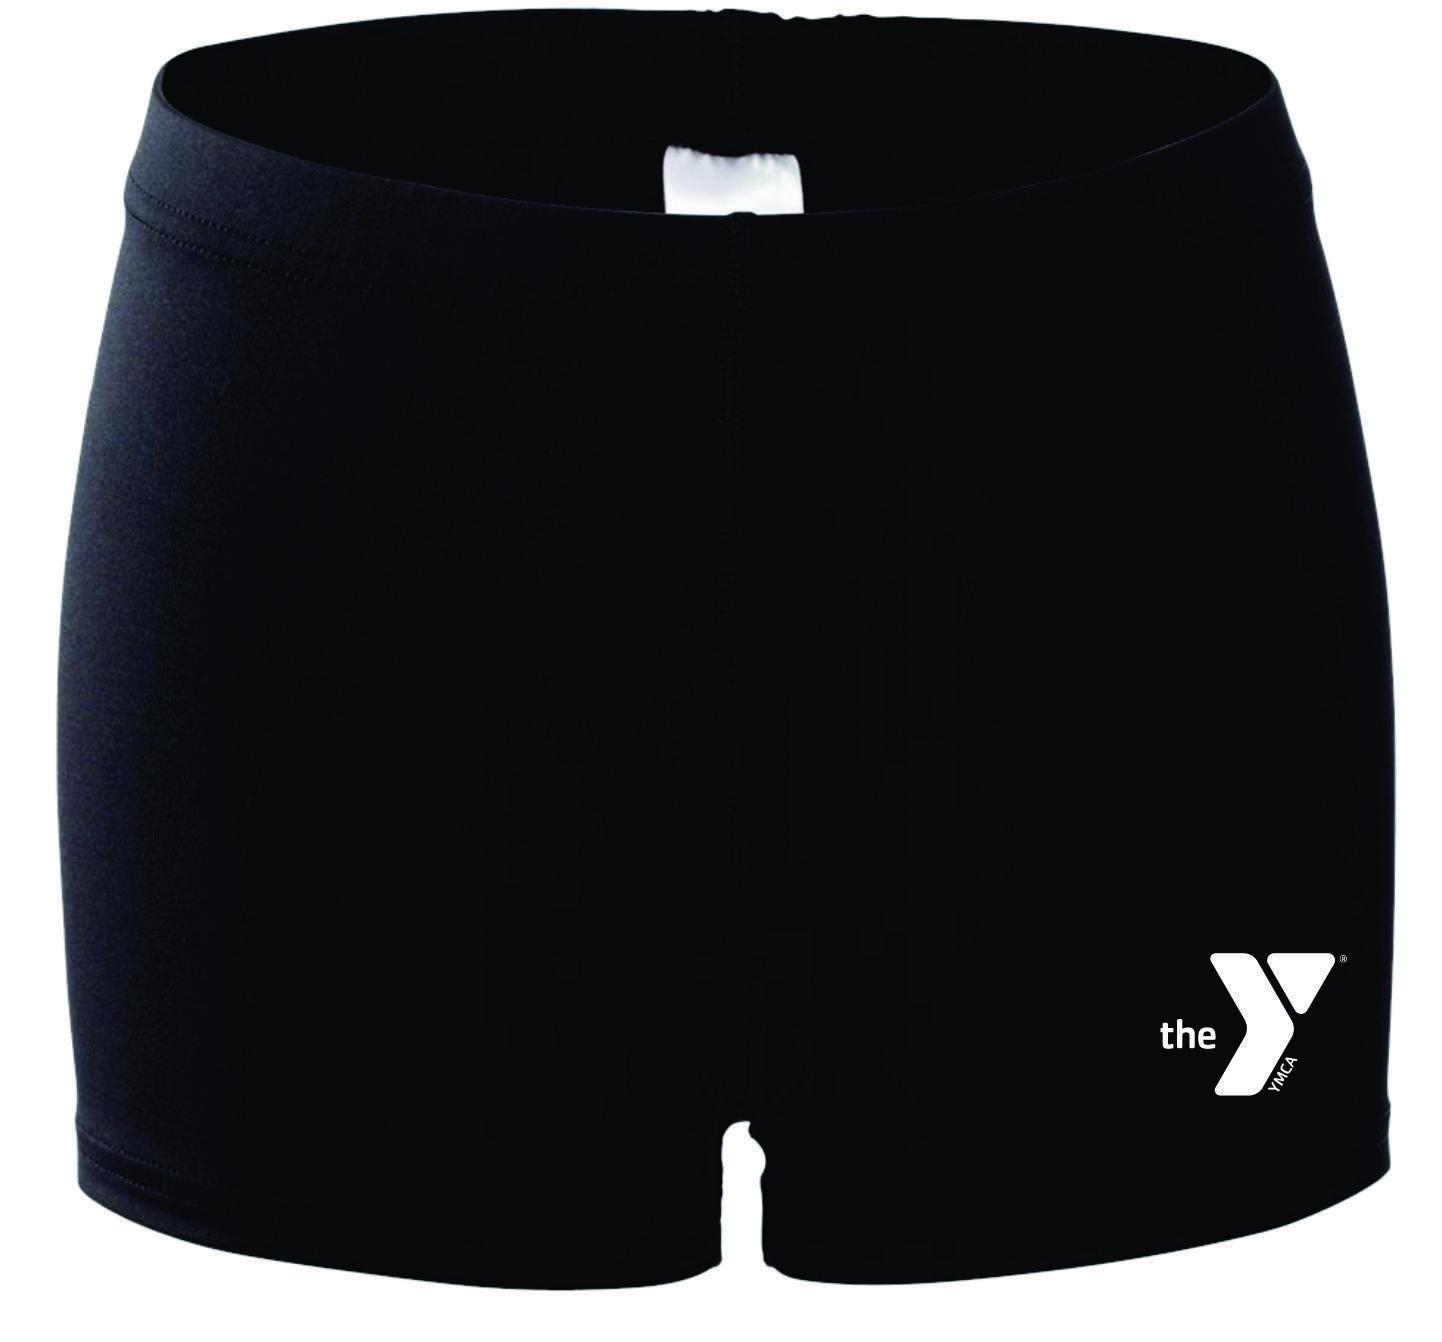 Ladies' Compression Shorts